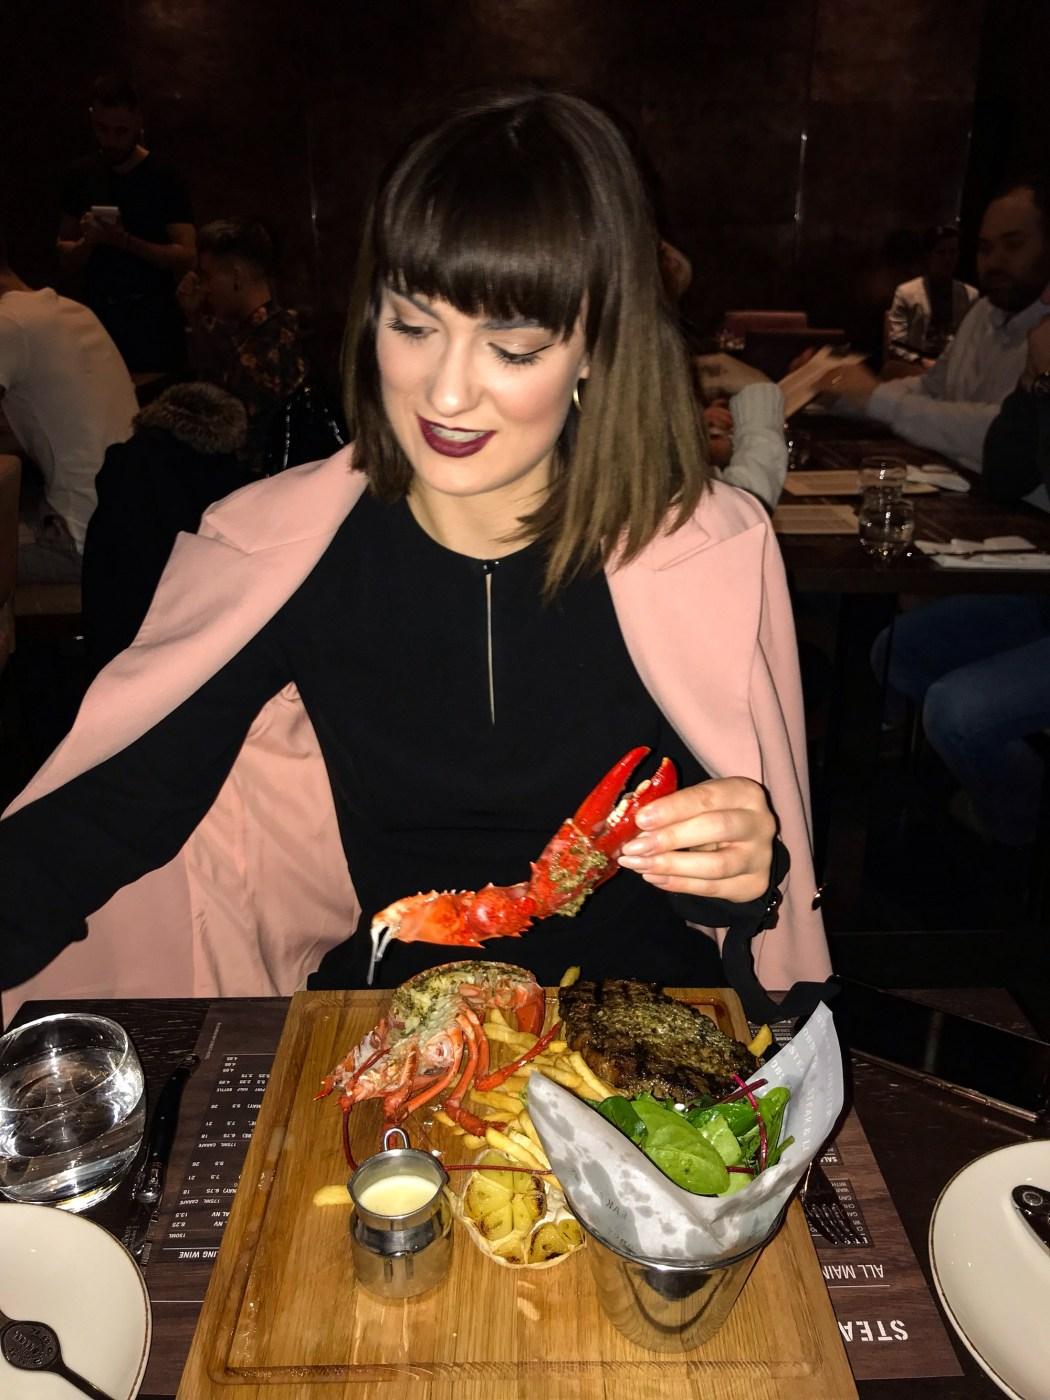 kristen byass at steak and lobster bloomsbury